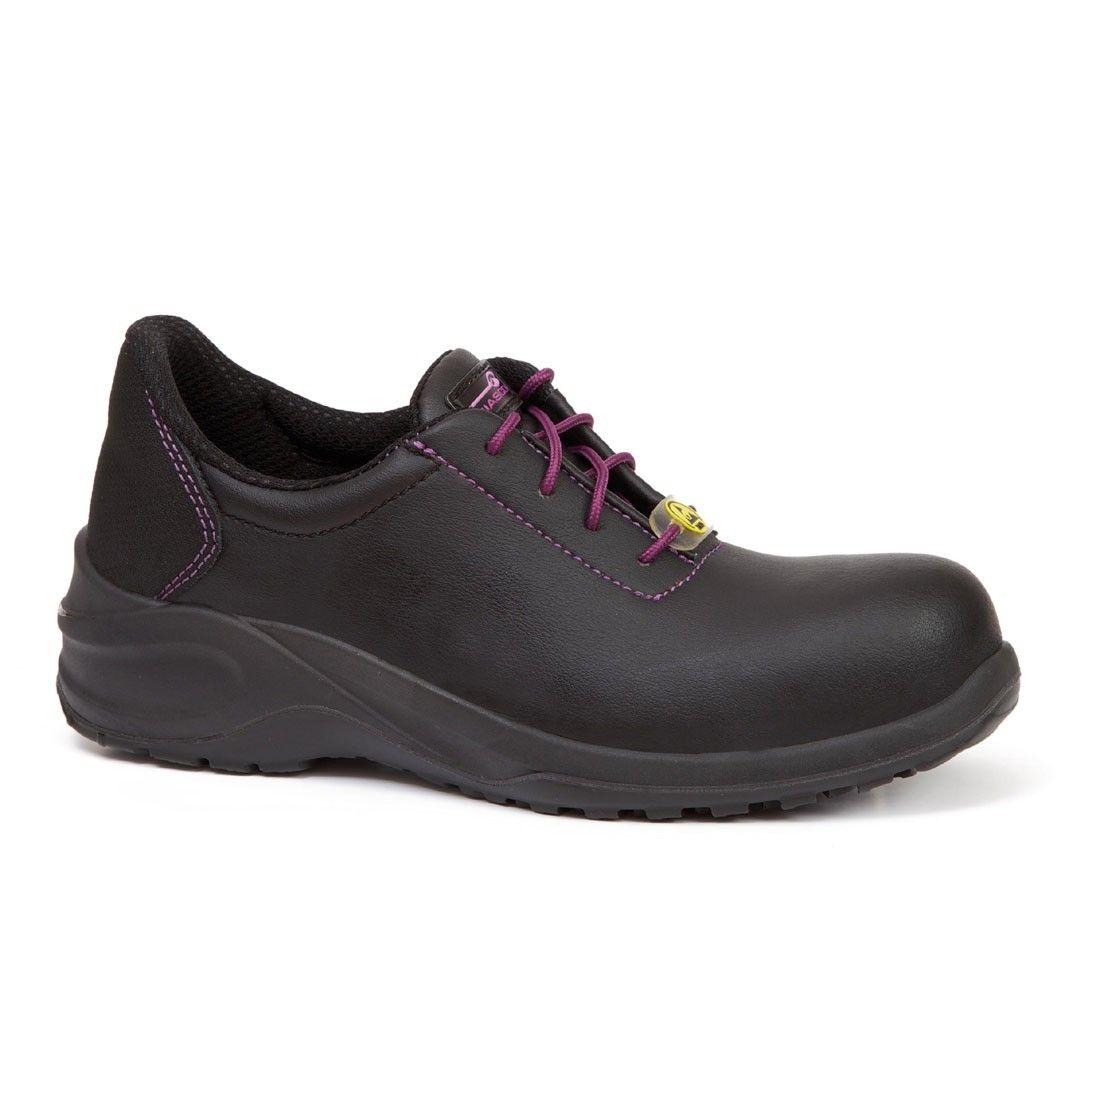 e0a3a10c679e Giasco Lily Lightweight Metal Free S3 Microwash ESD Ladies Safety Shoes